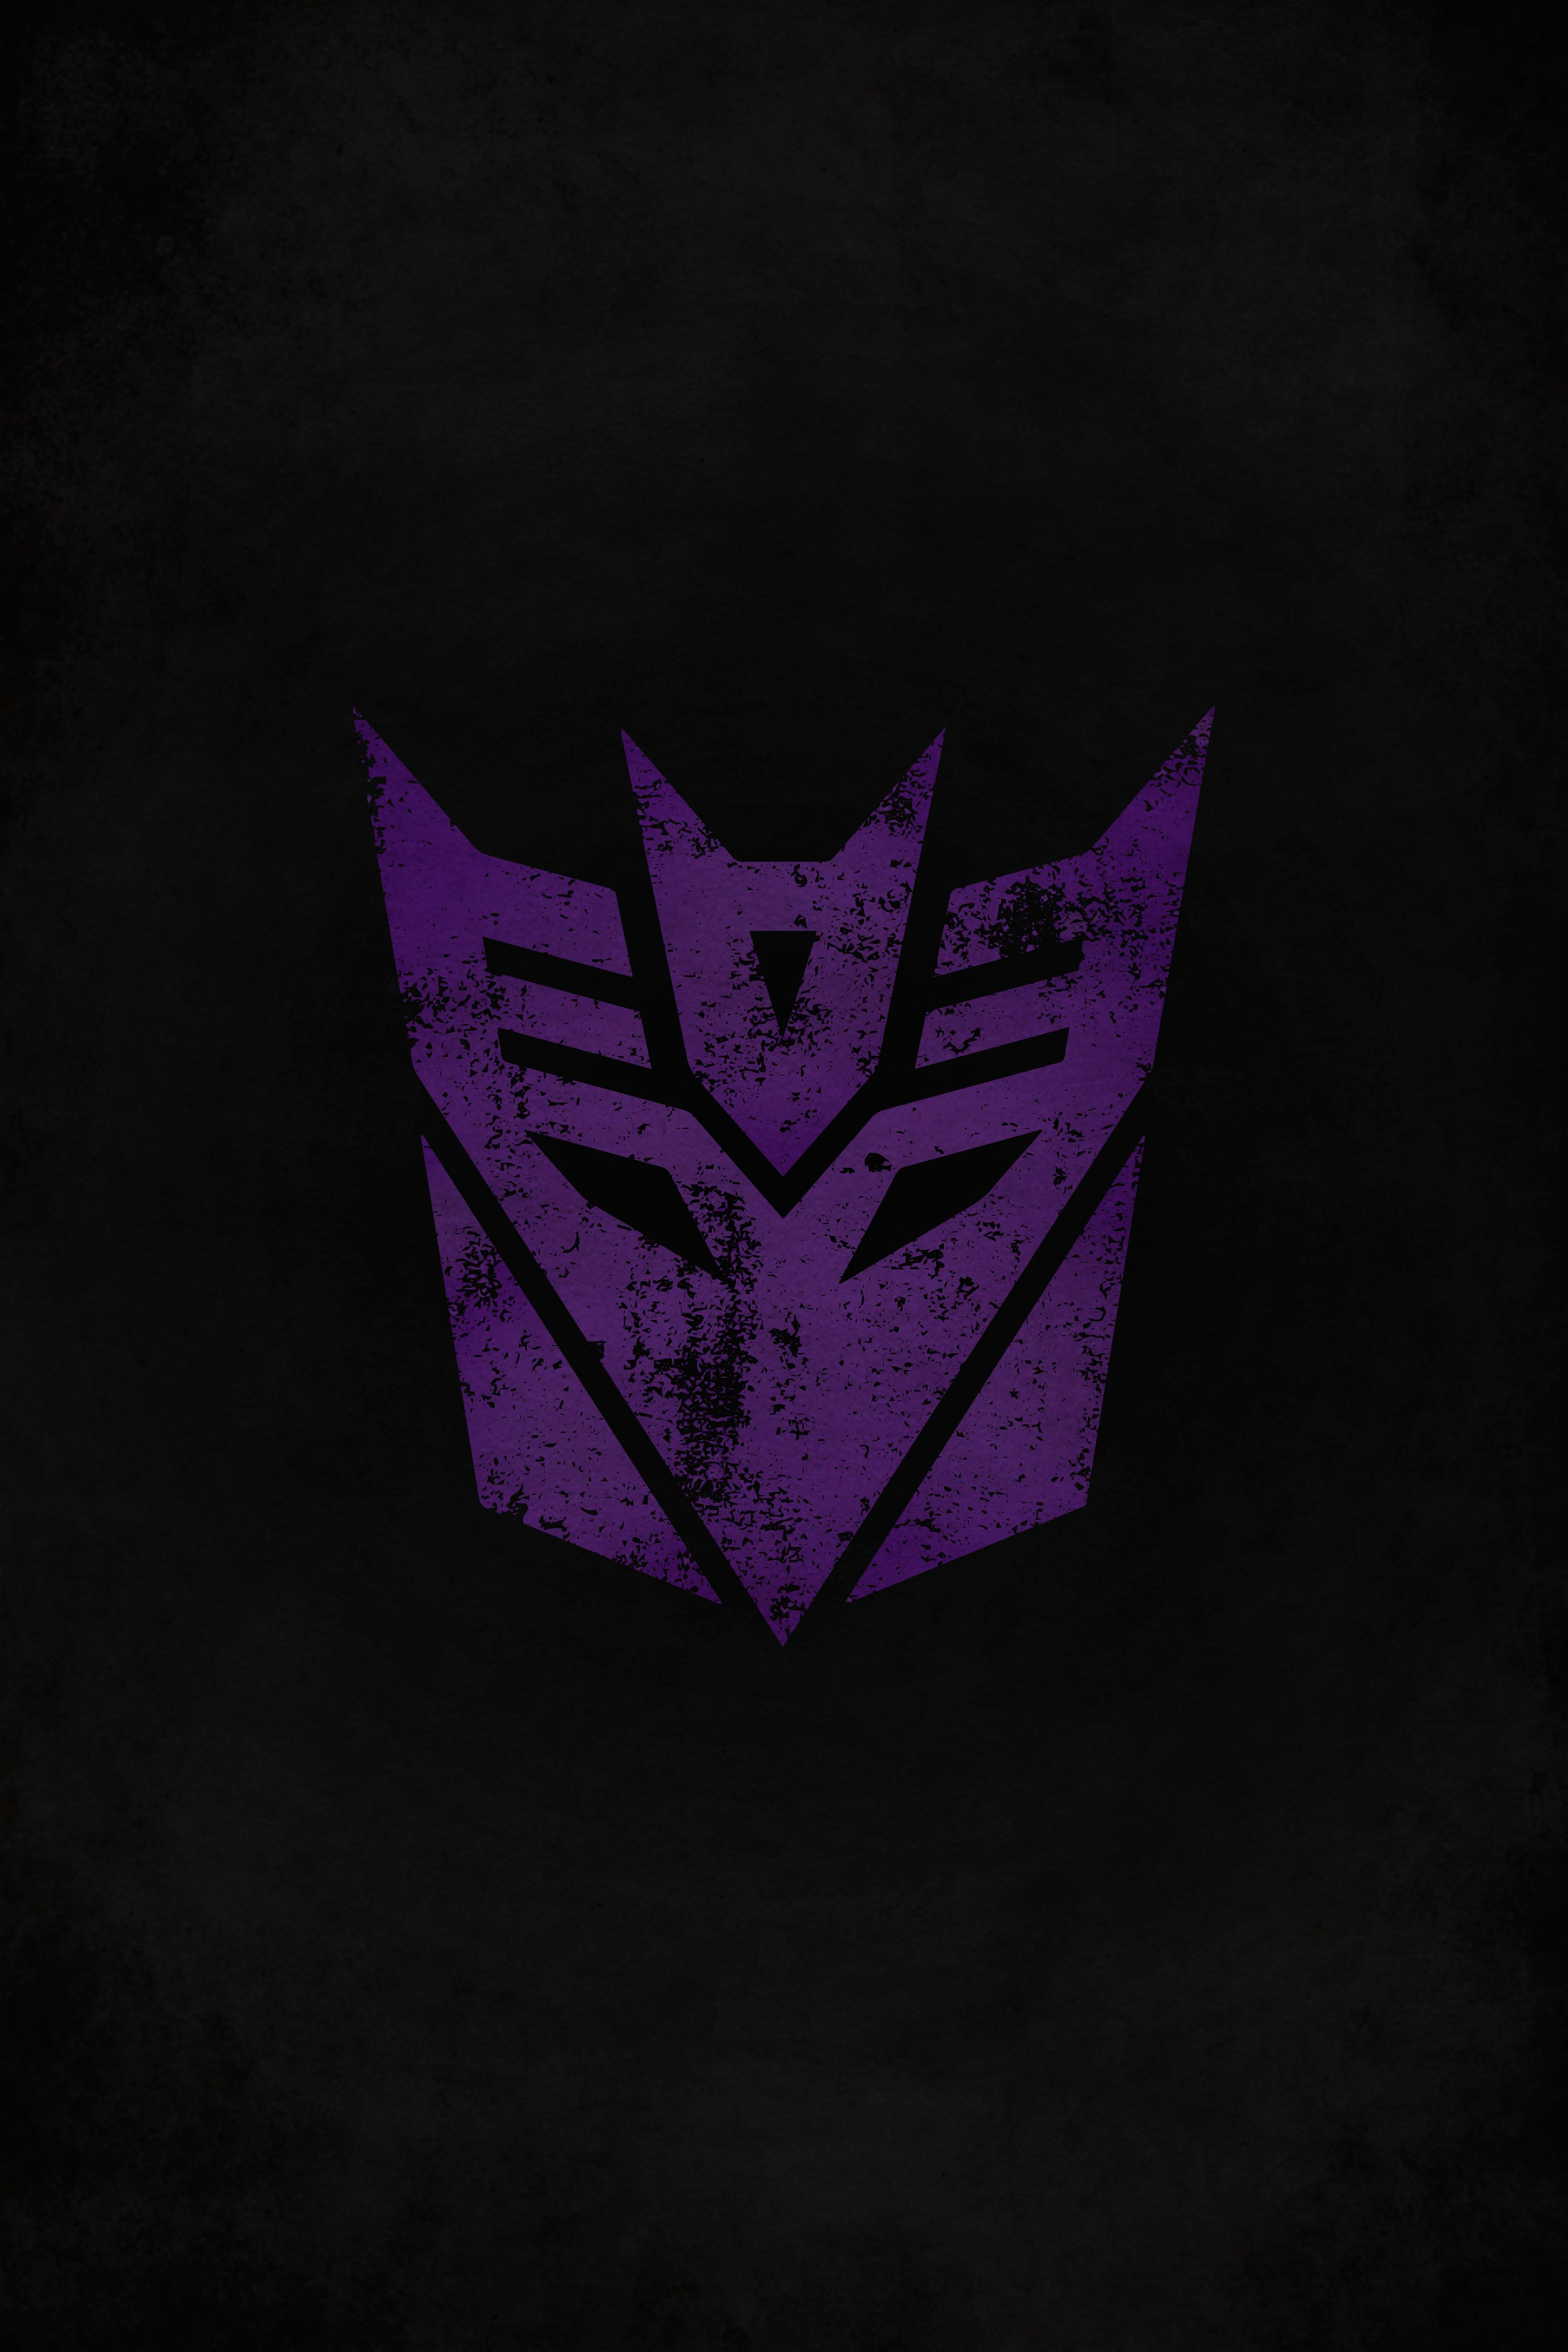 Logogami Shop Redbubble Transformers Art Transformers Decepticons Logo Transformers Decepticons